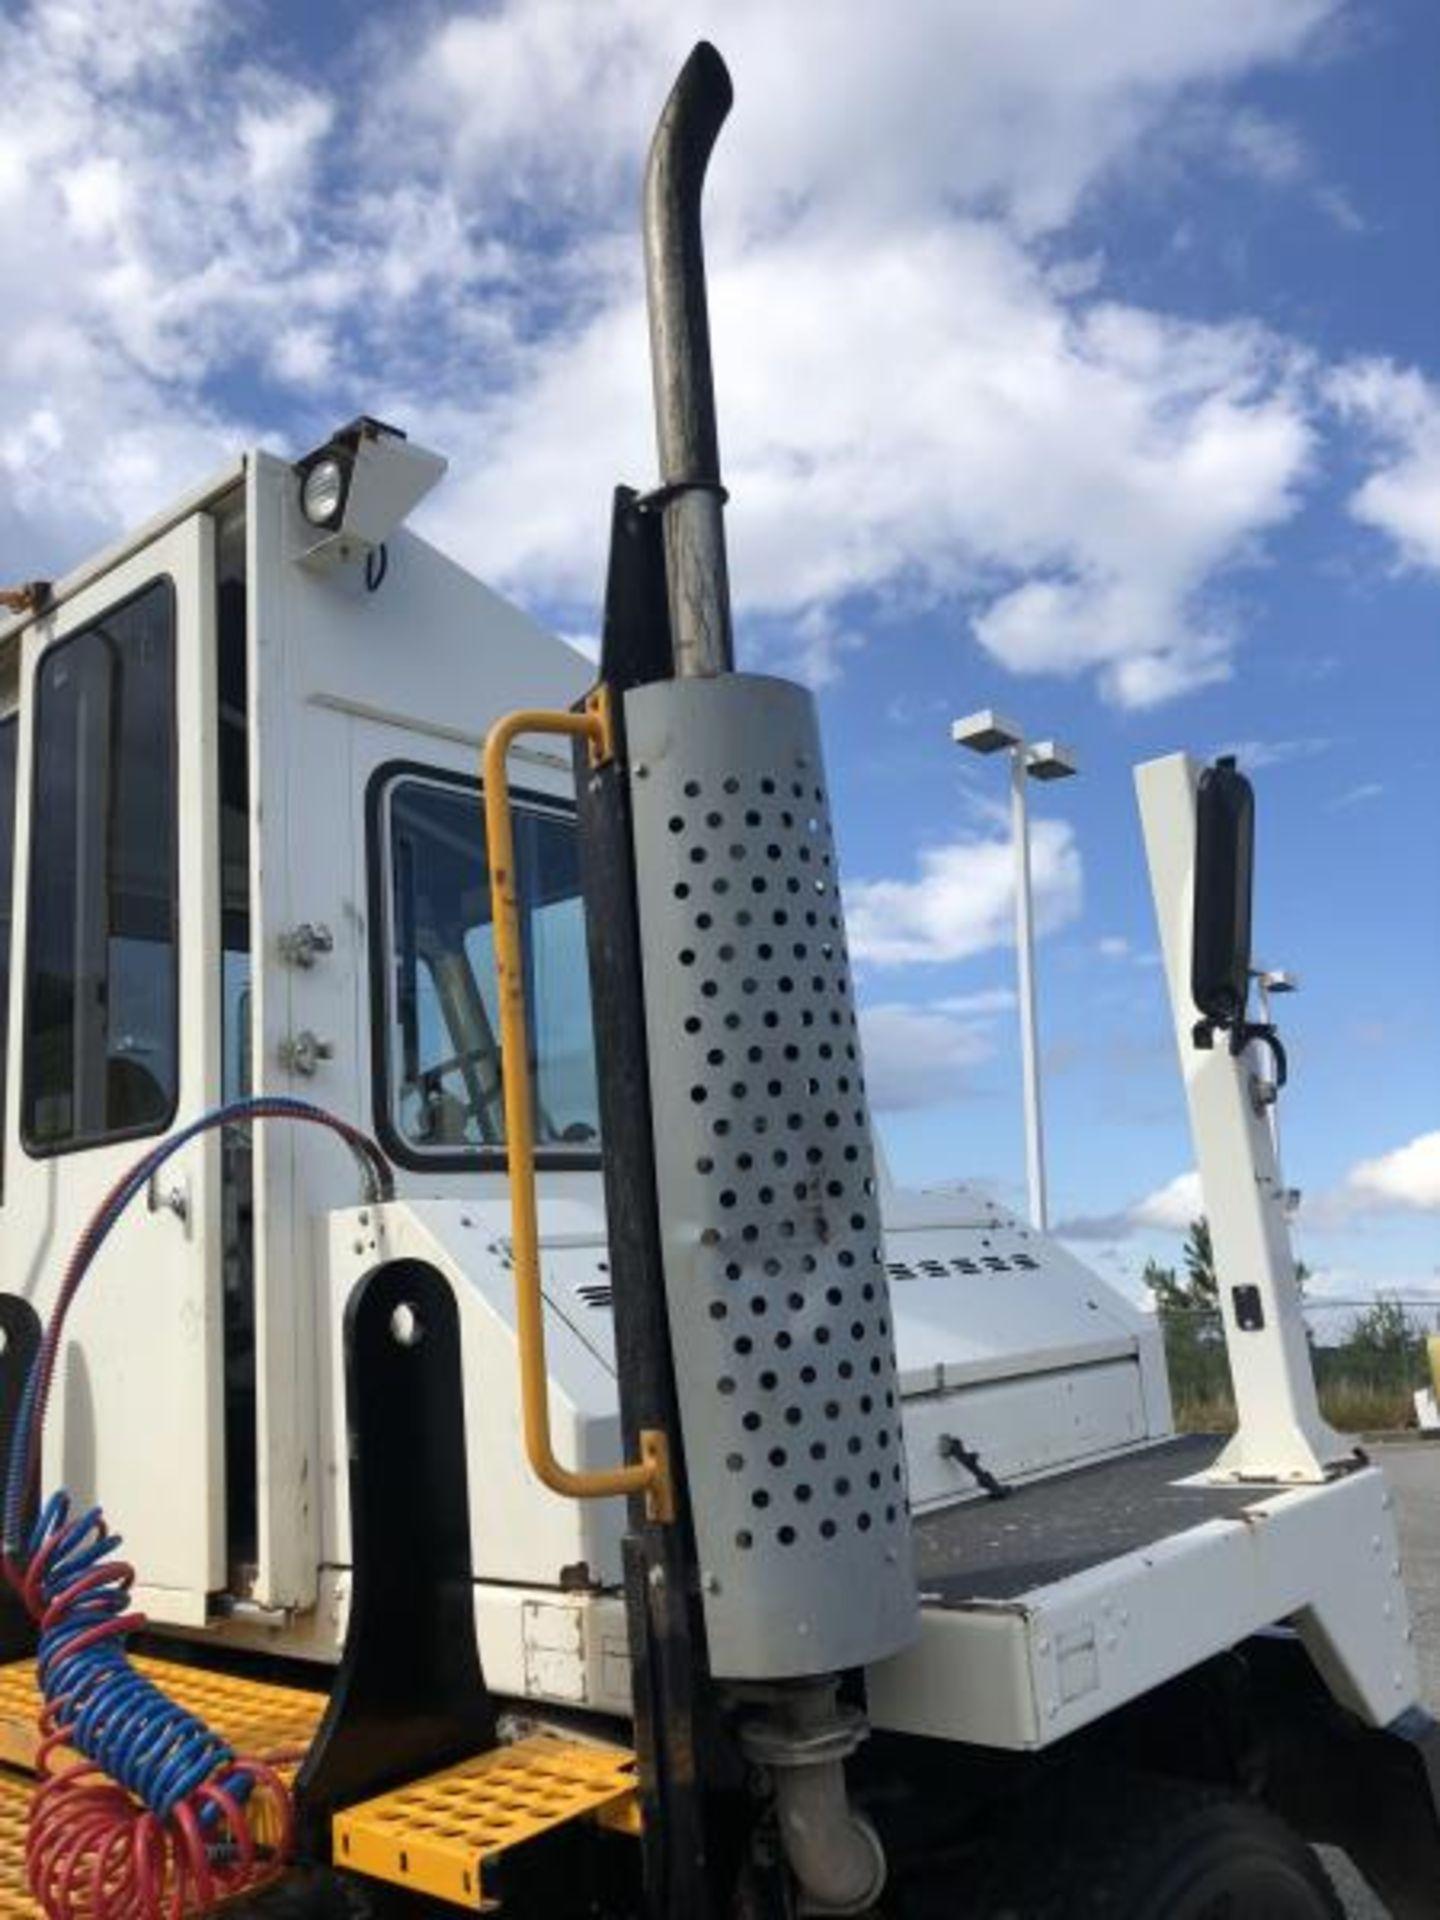 2015 Kalmar Ottawa 4x2 Yard Truck , SN: 338841 4,267.2 Hours, 1,683 Miles - Image 16 of 34